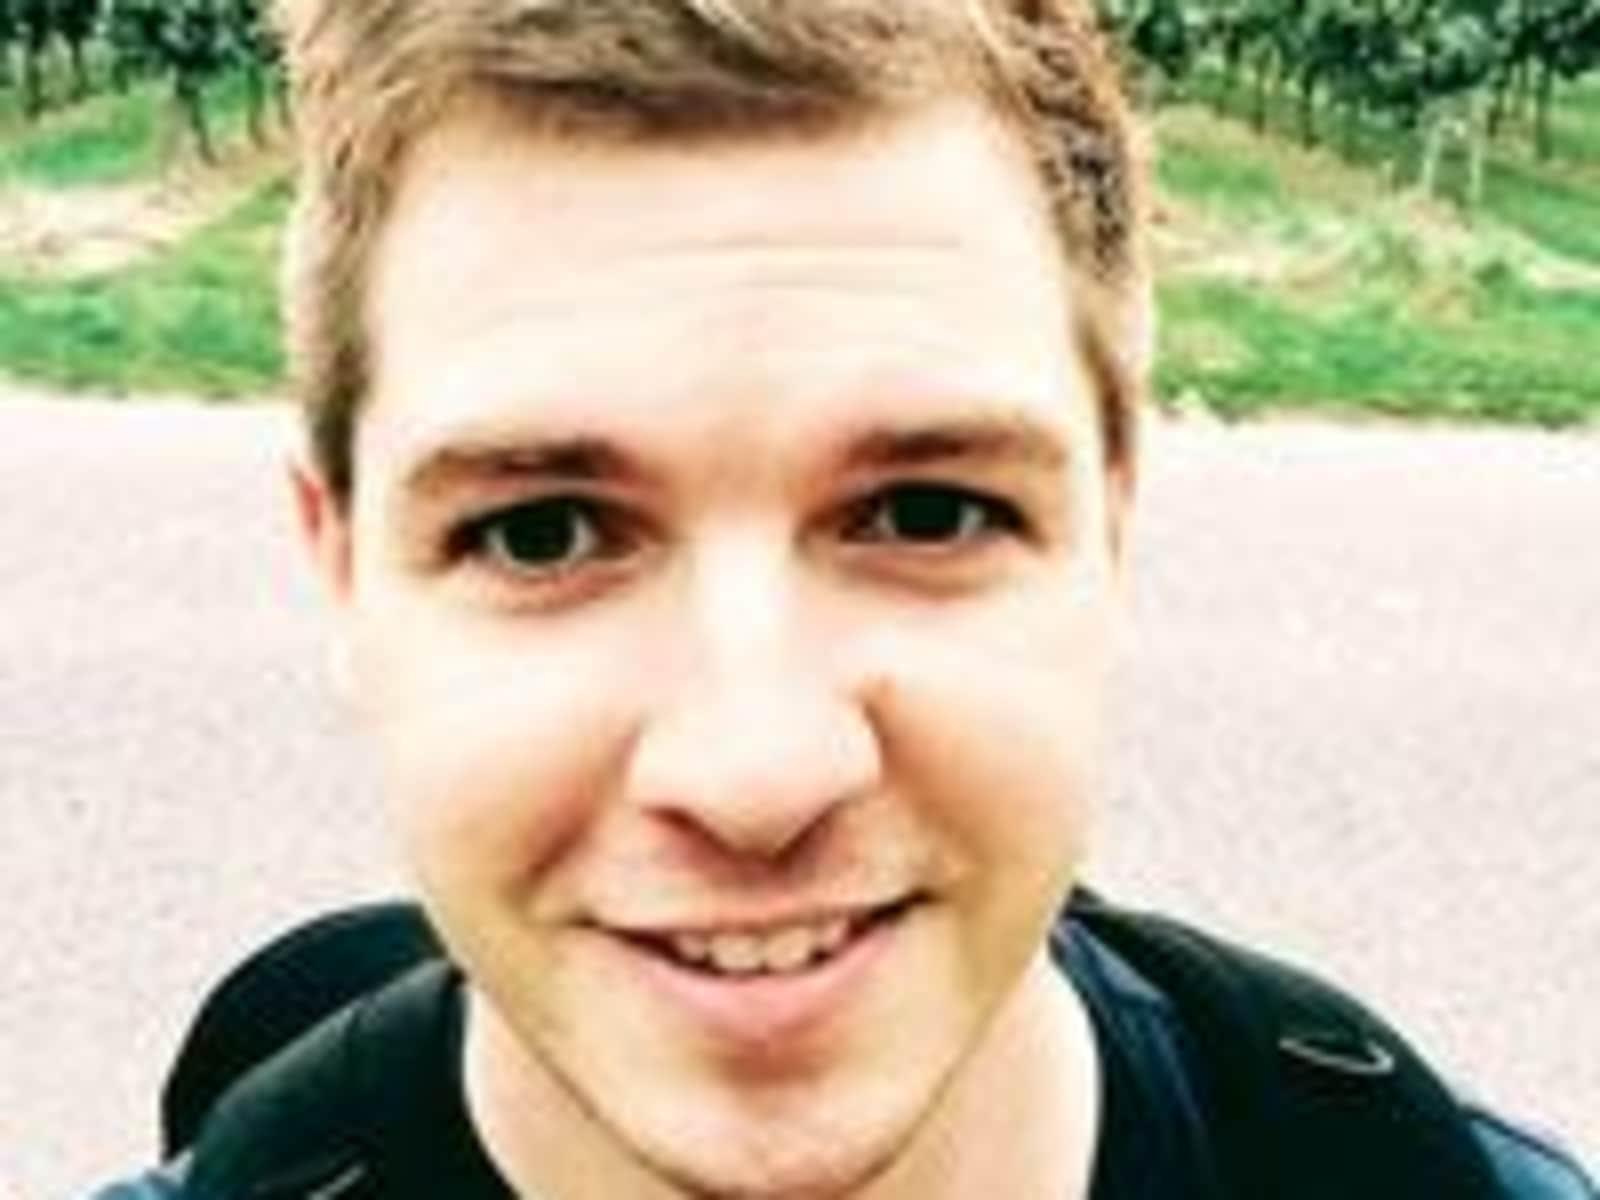 Marius from Winnipeg, Manitoba, Canada